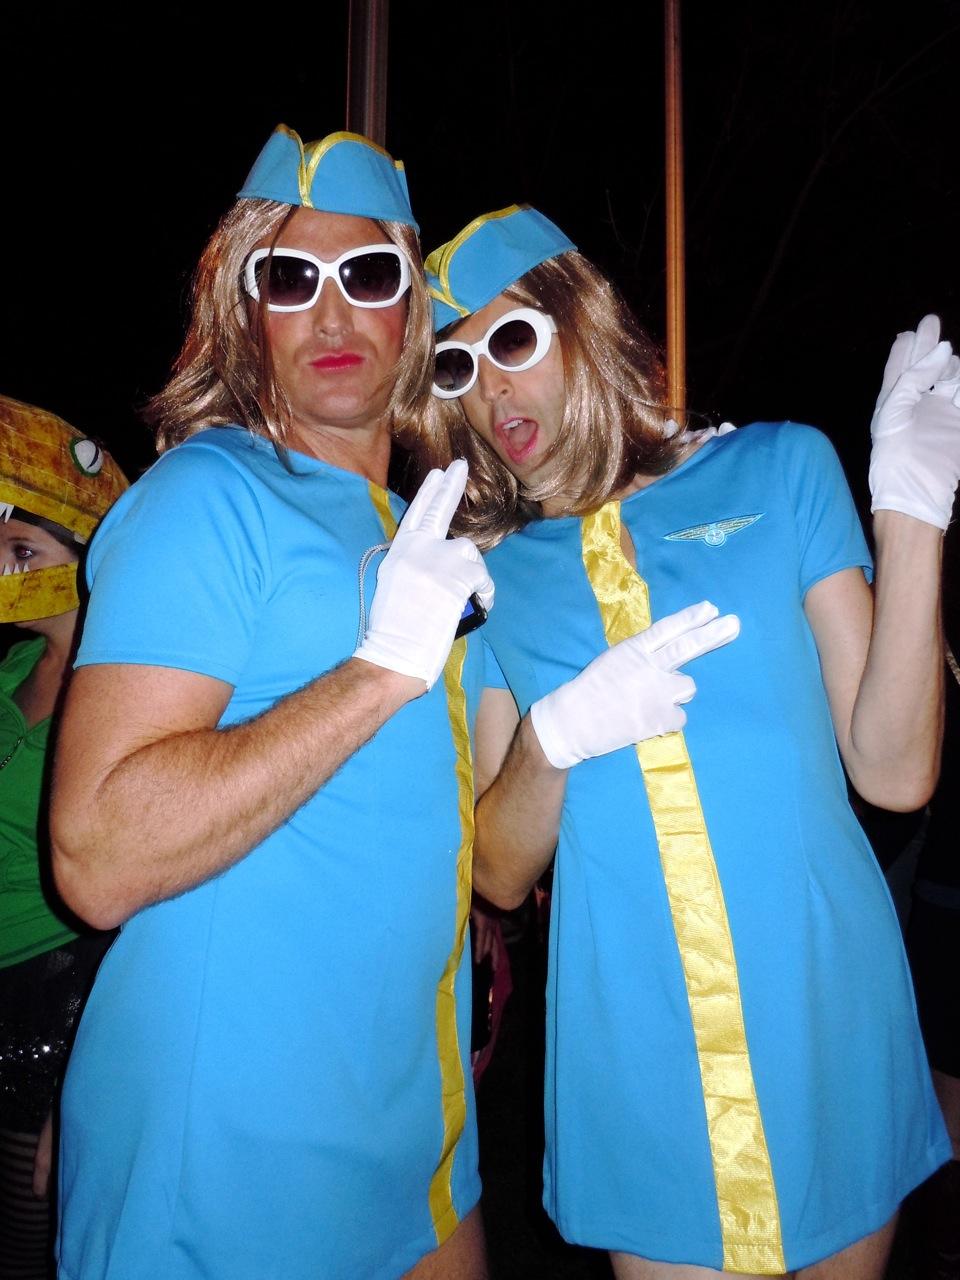 WEHO Halloween Carnaval 2010 flight attendants  sc 1 st  Jason in Hollywood & Costume inspiration from West Hollywood Halloween Carnavals past ...